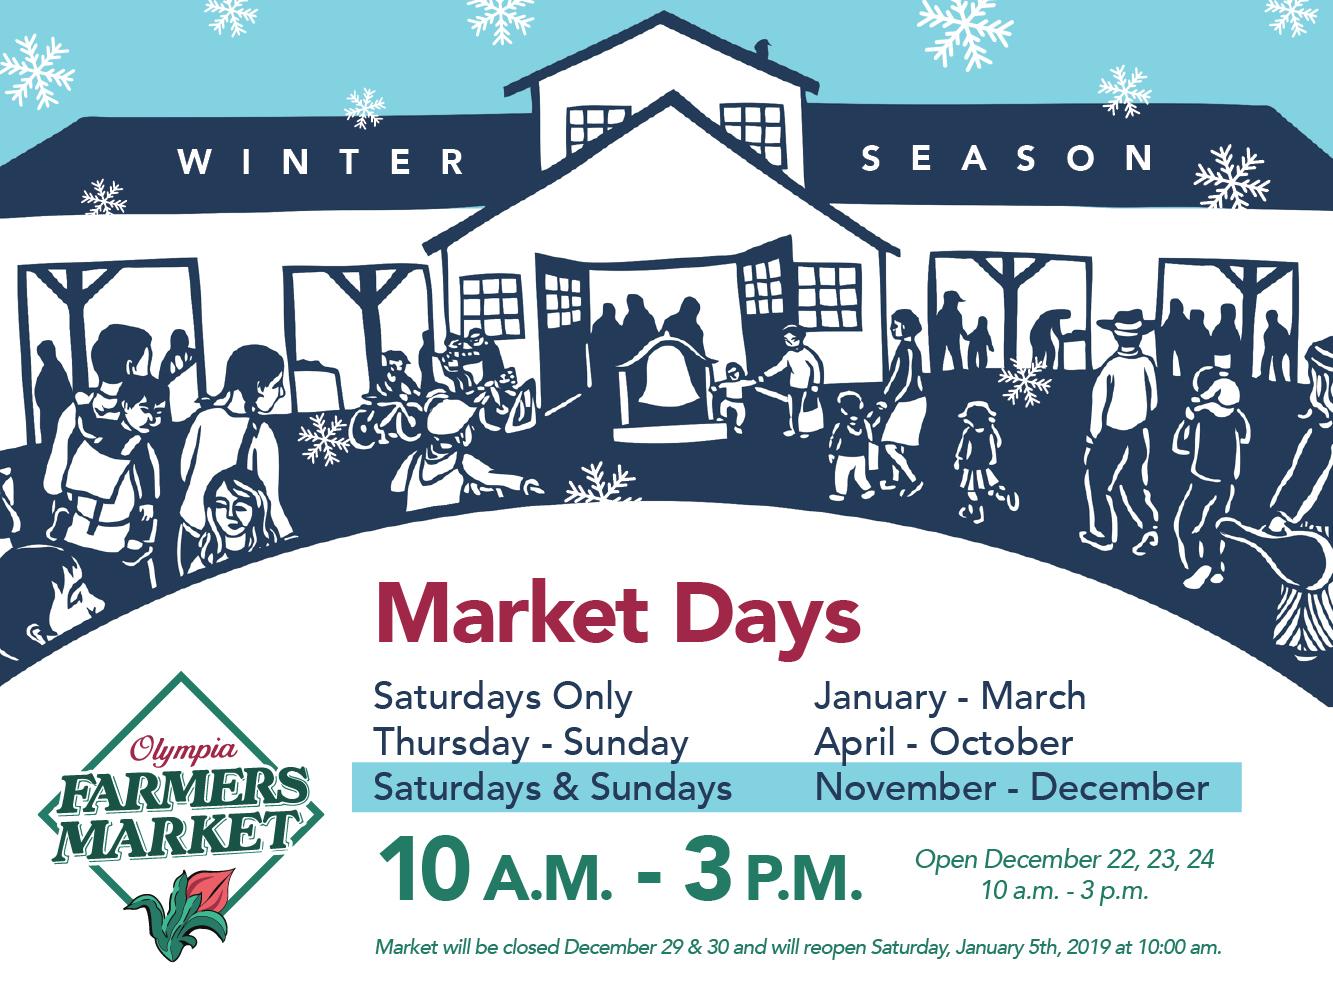 olympia farmers market announces